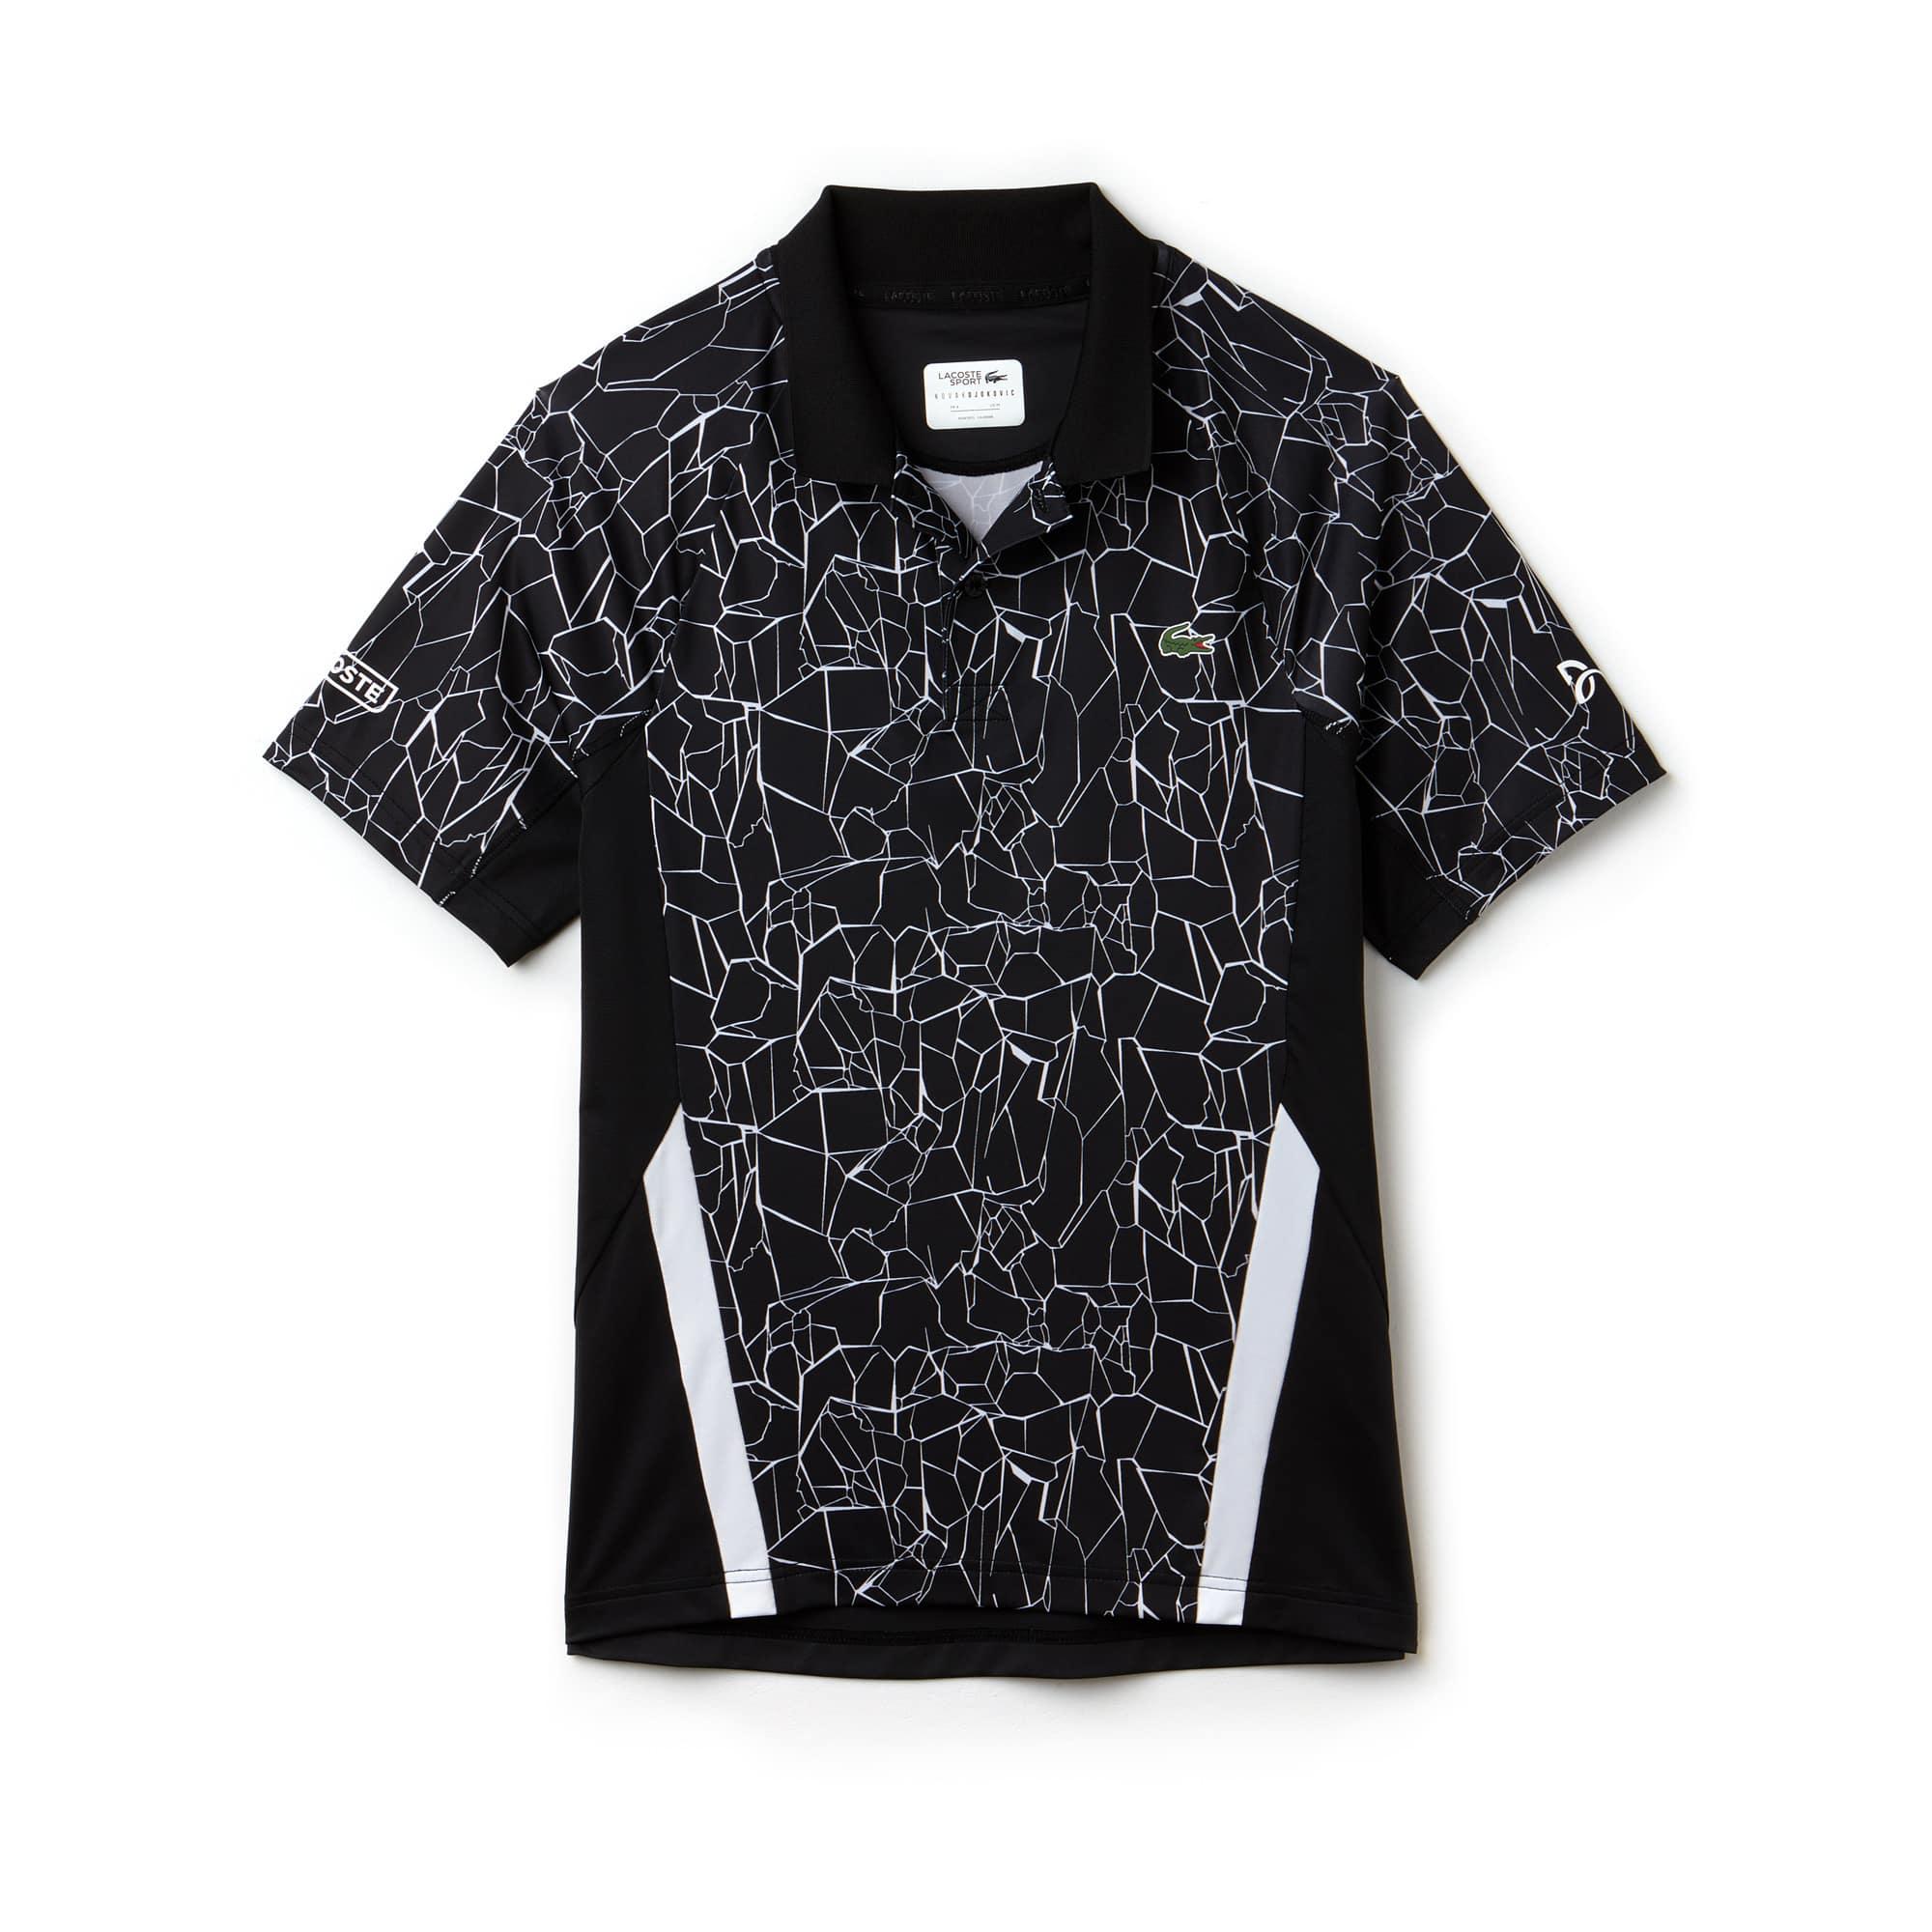 865a3232 Men's SPORT Print Technical Jersey Polo - Lacoste x Novak Djokovic ...